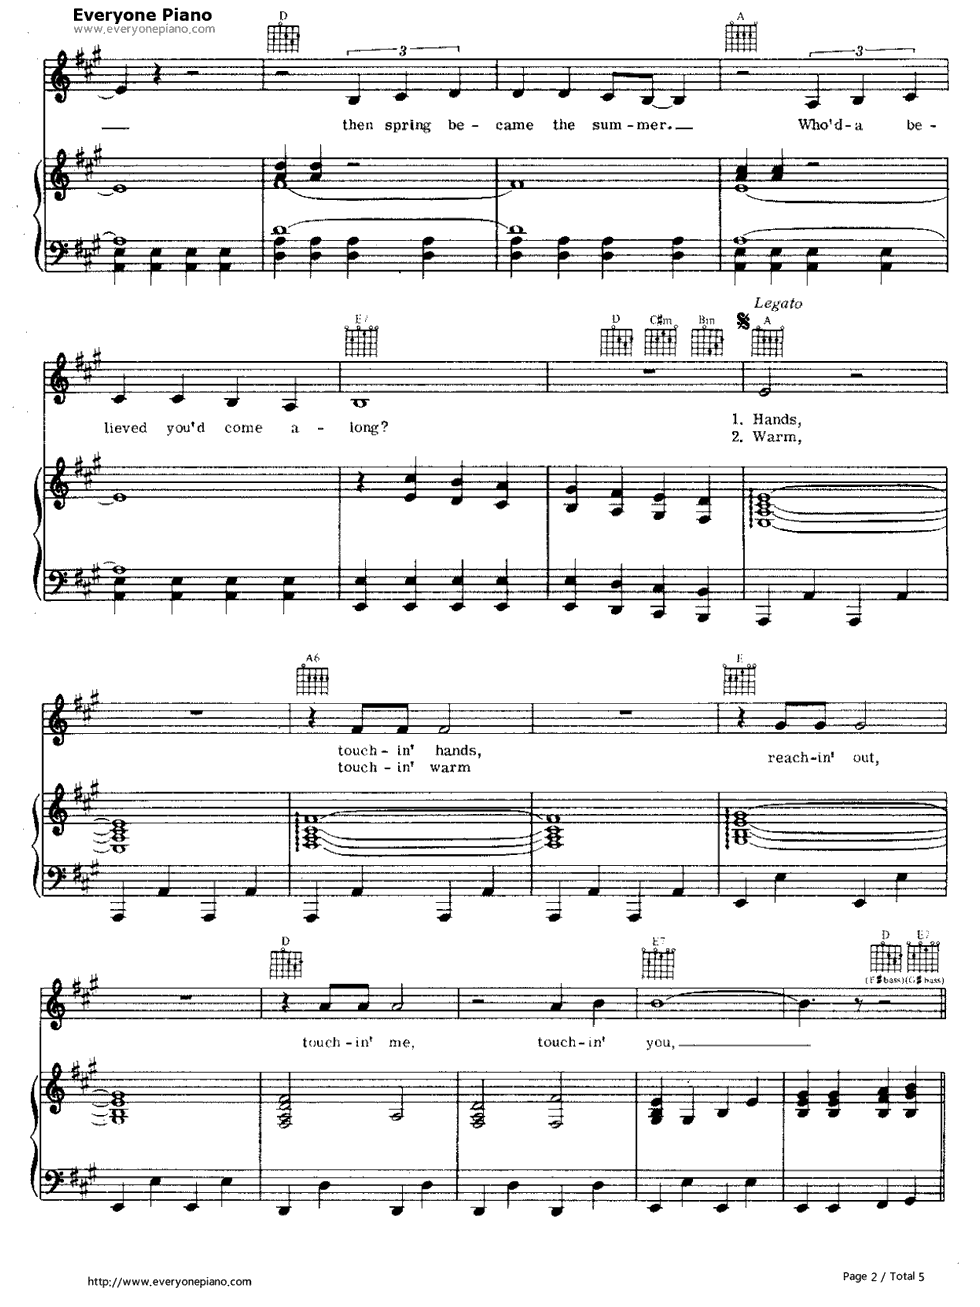 Sweet Caroline-Neil Diamond Stave Preview 2-Free Piano Sheet Music u0026 Piano Chords